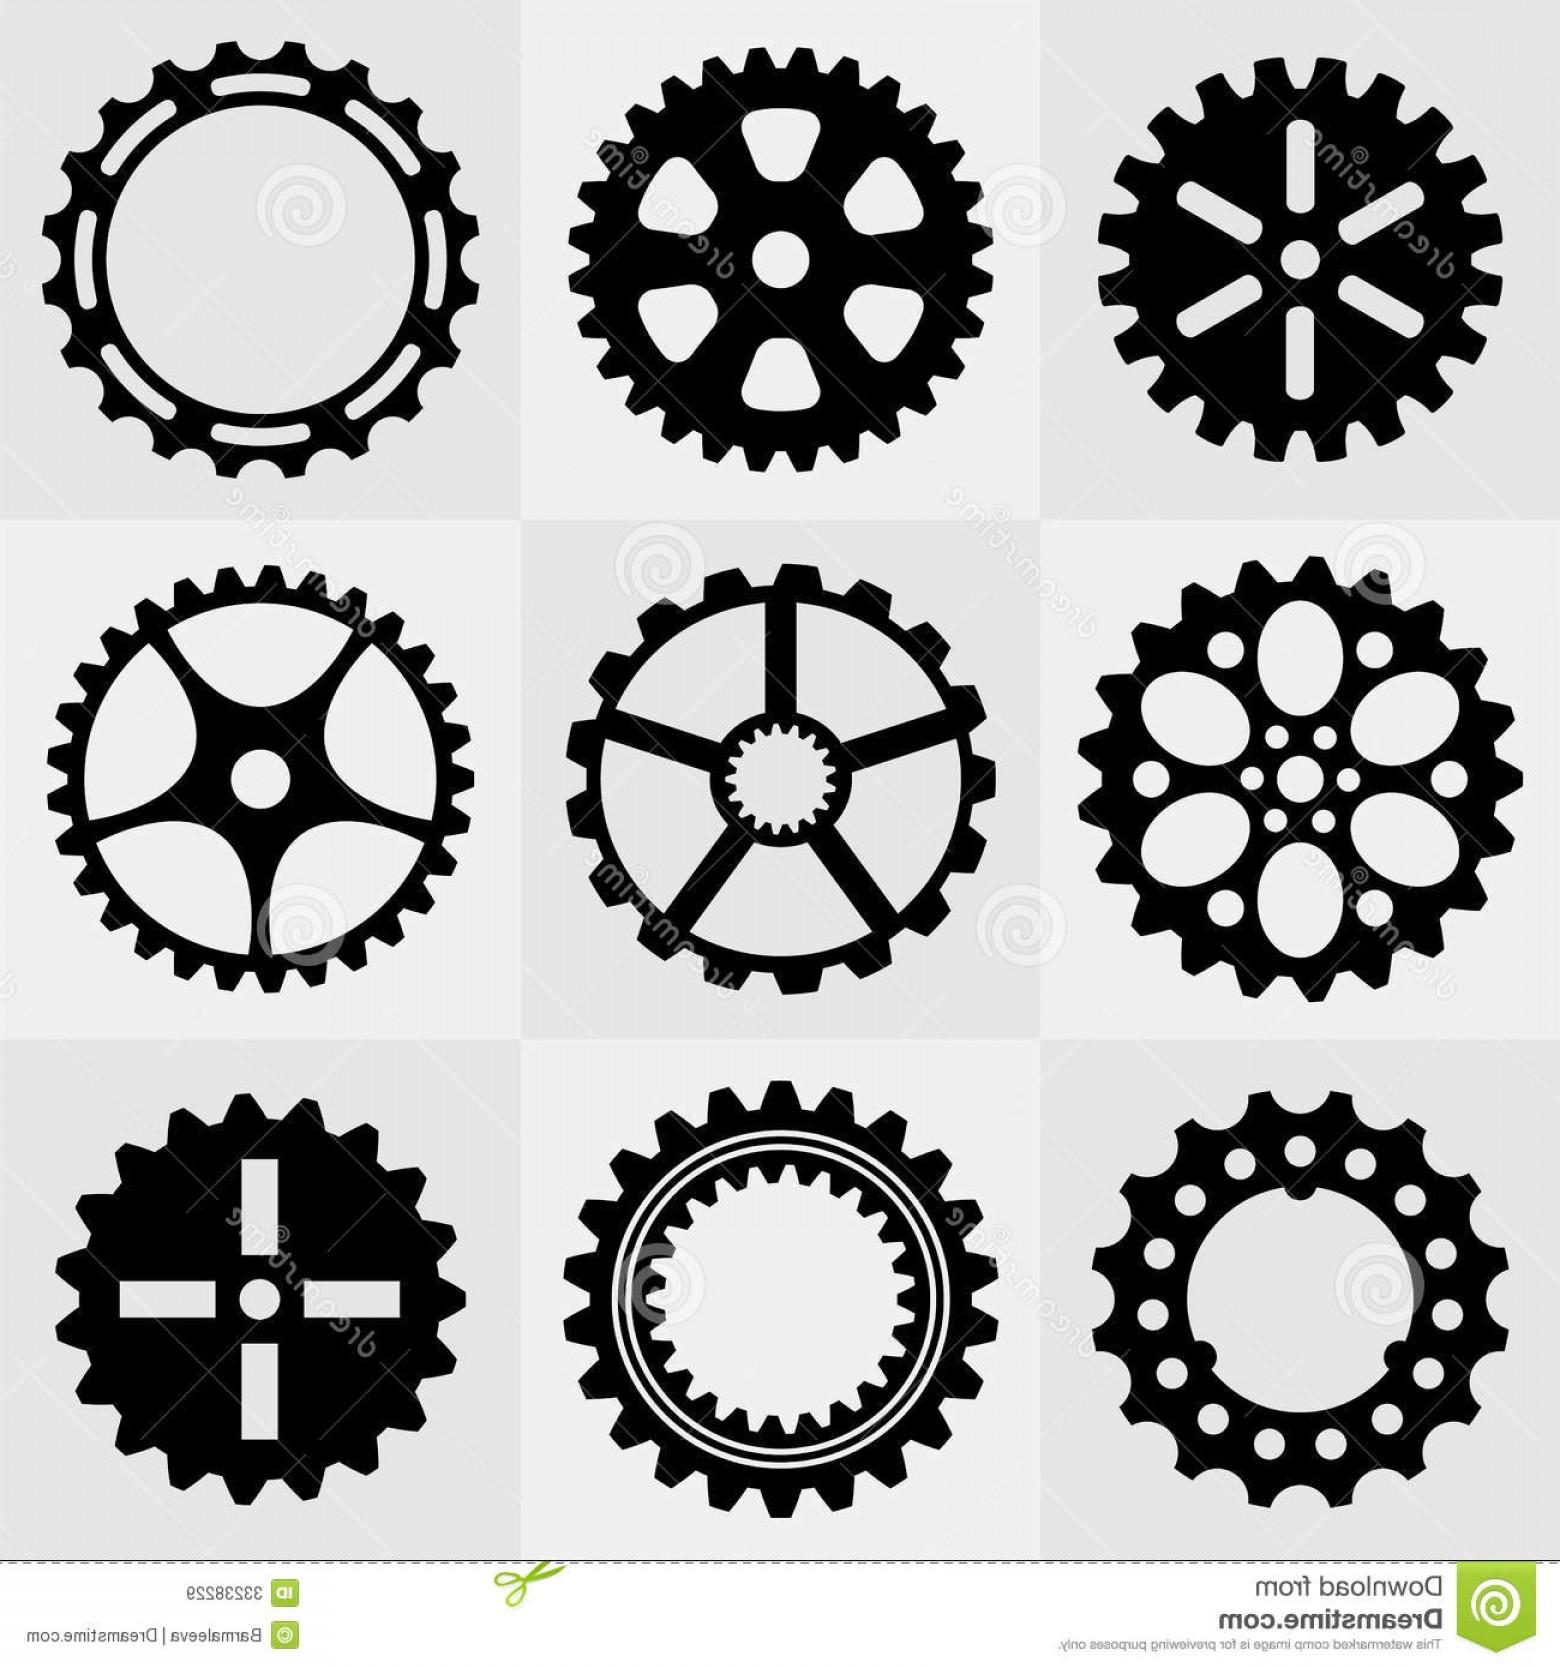 1560x1668 Royalty Free Stock Images Set Gear Wheels Vector Image Sohadacouri